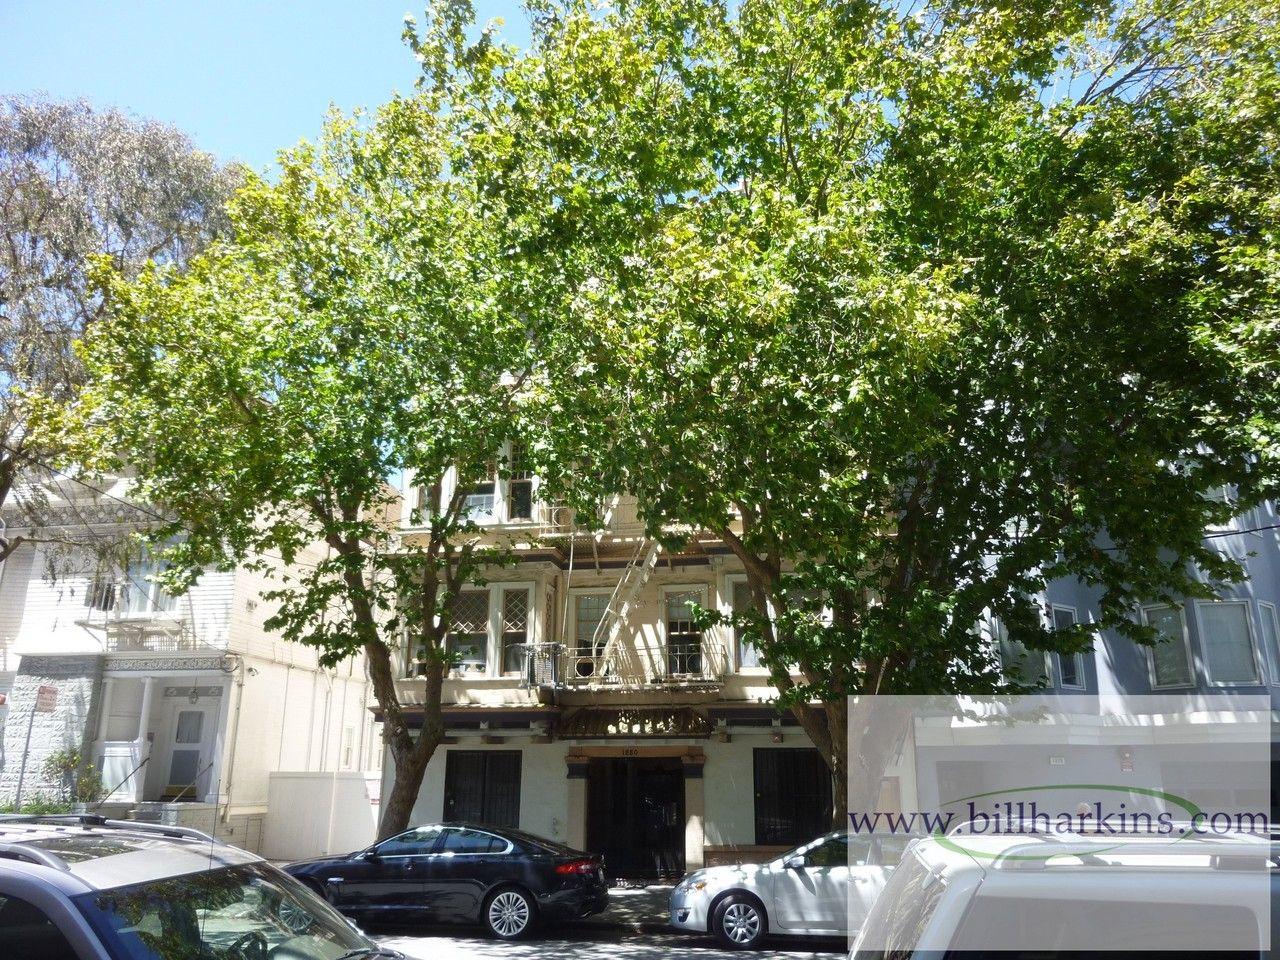 1880 page street 5 san francisco ca 94117 4 bedroom - 4 bedroom apartment san francisco ...